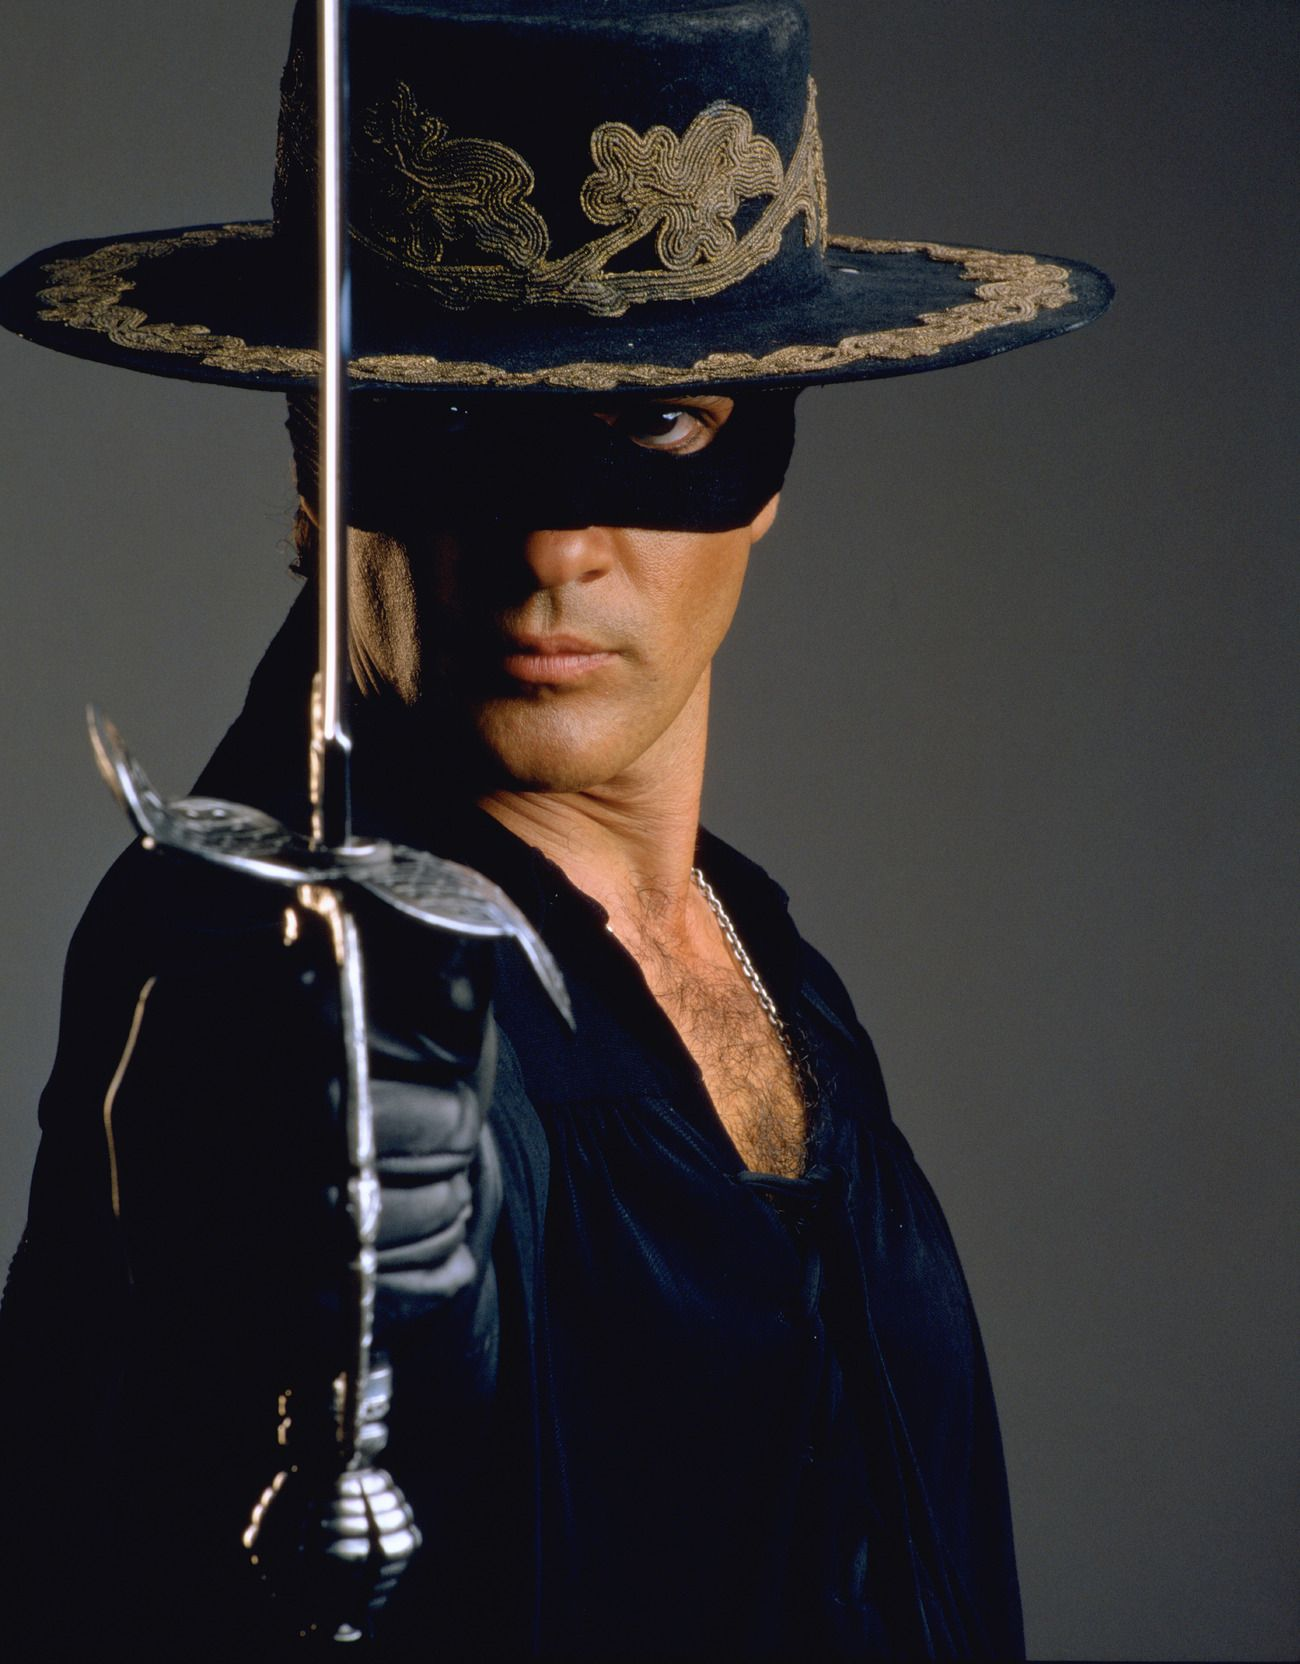 Zorro Antonio Banderas Google Search Antonio Bandeiras Zorro